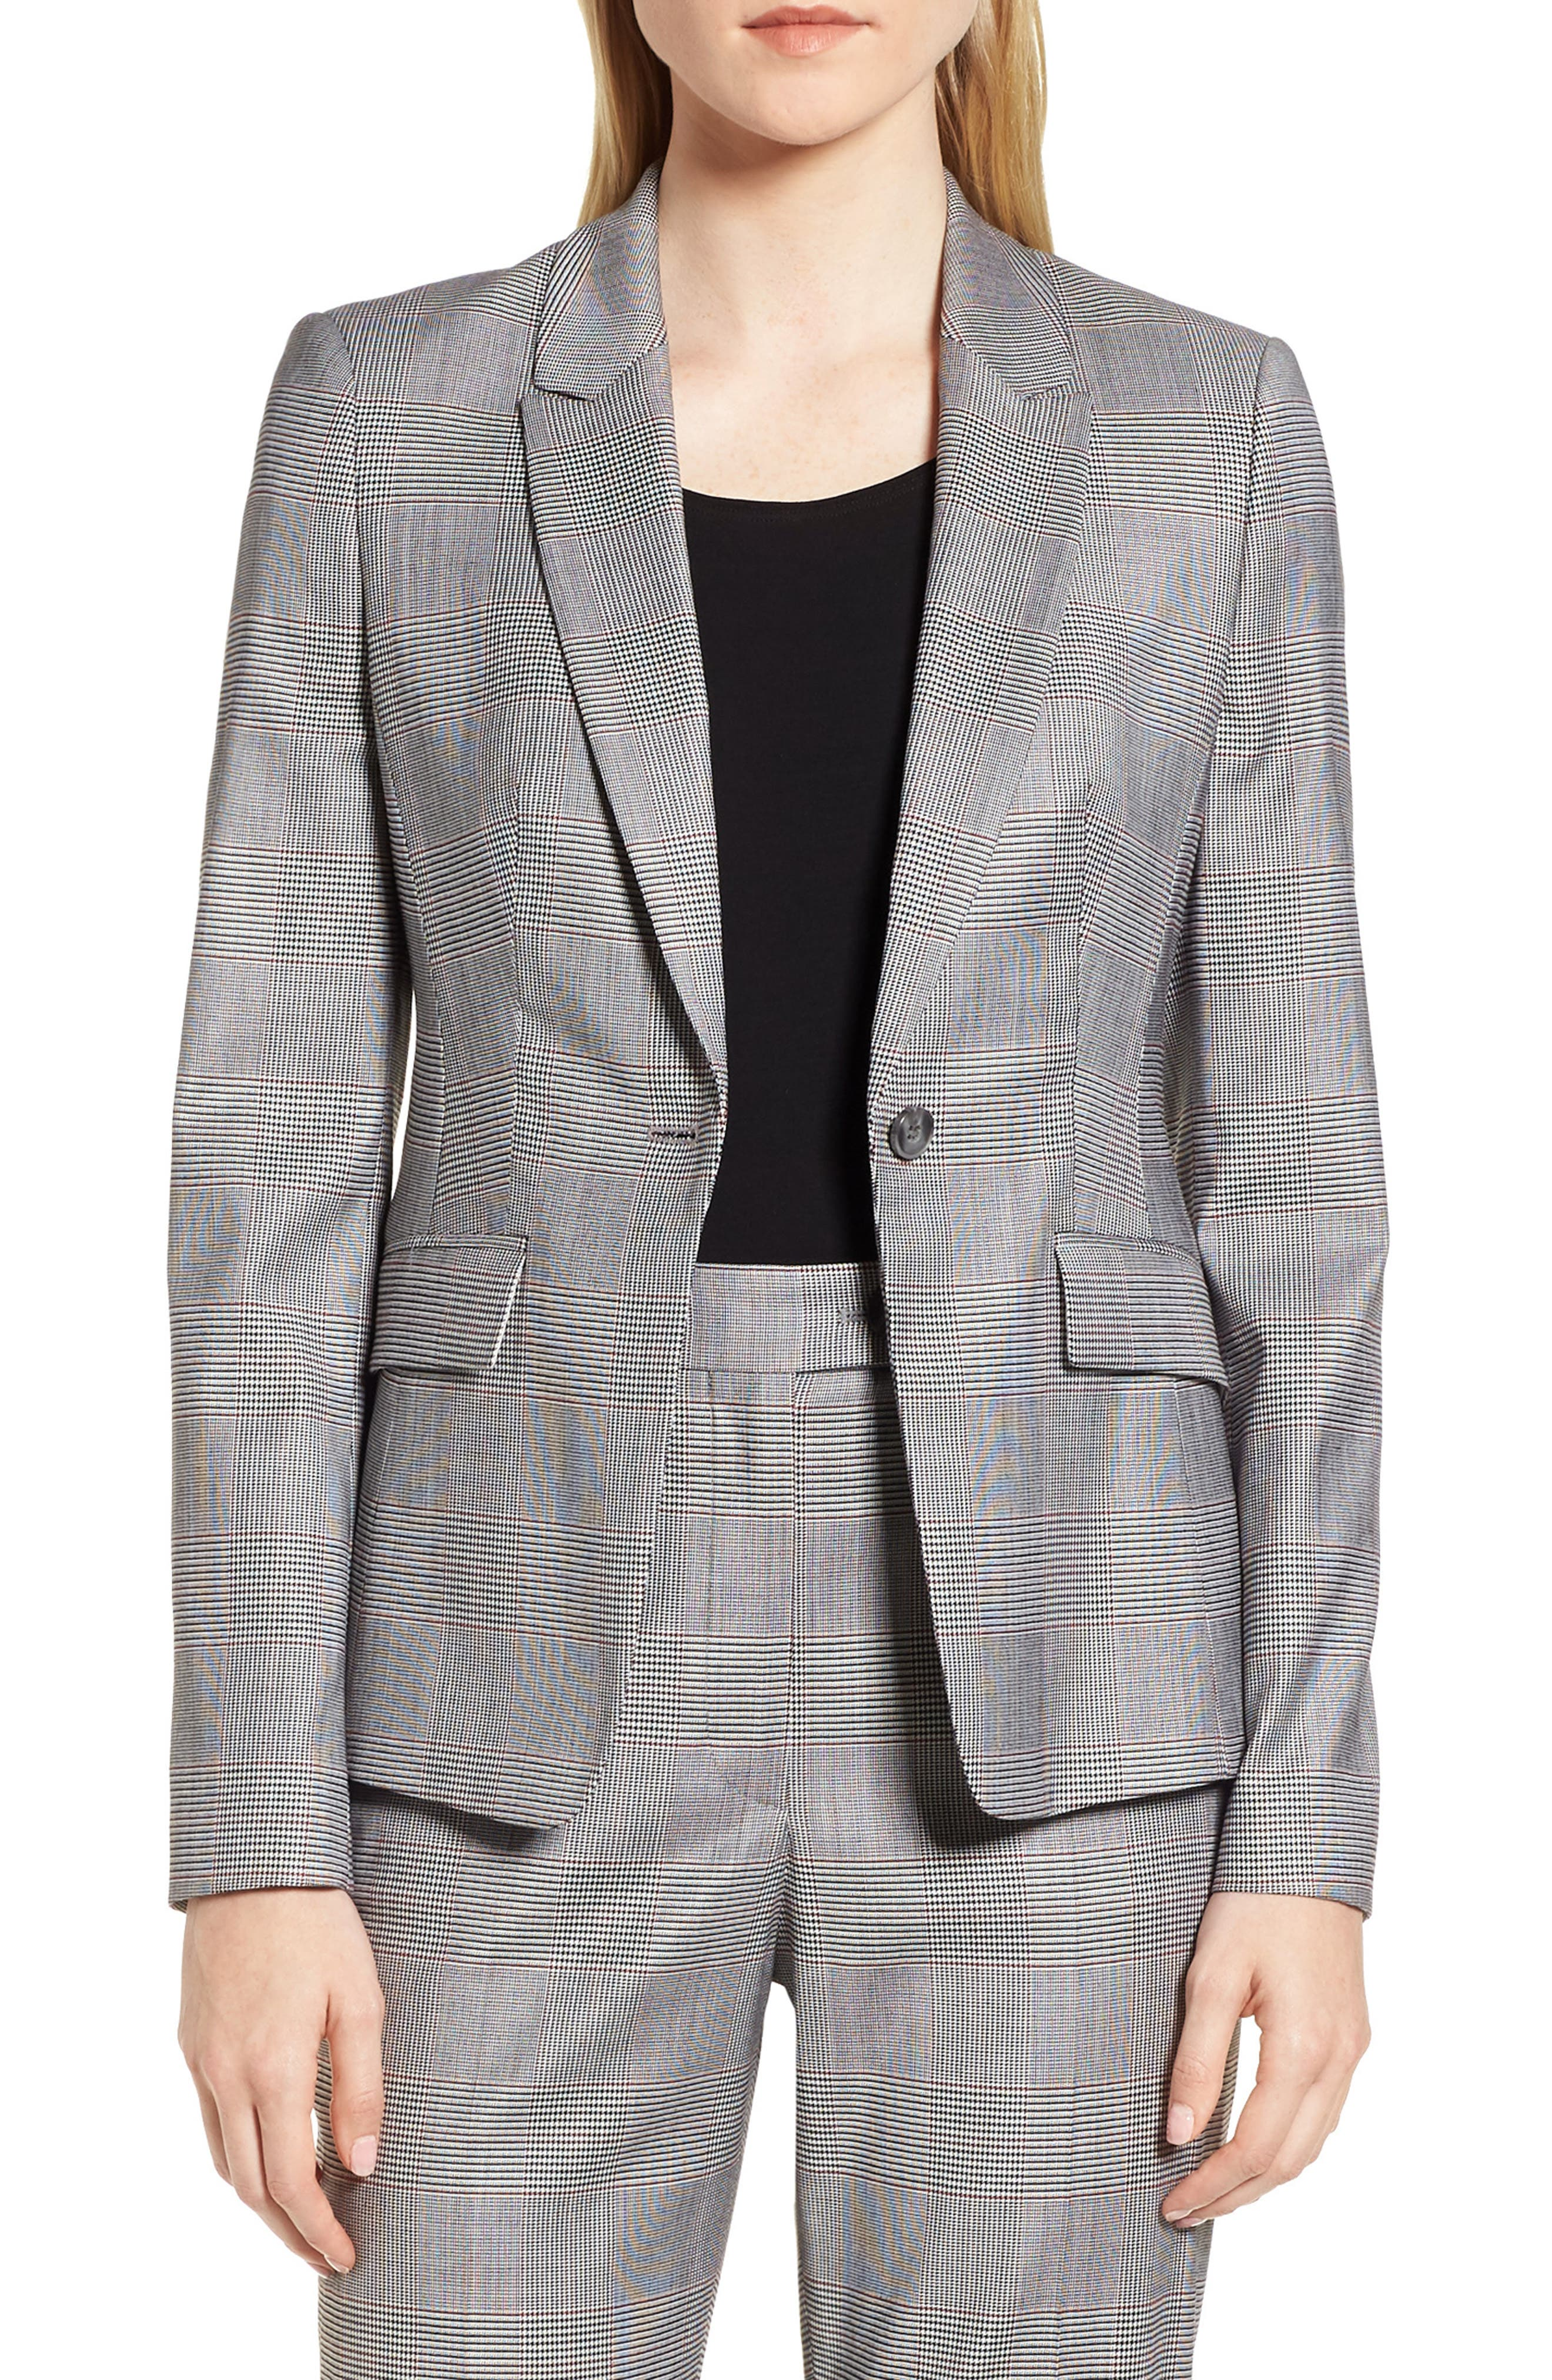 Jofilia Glencheck Jacket,                         Main,                         color, 874